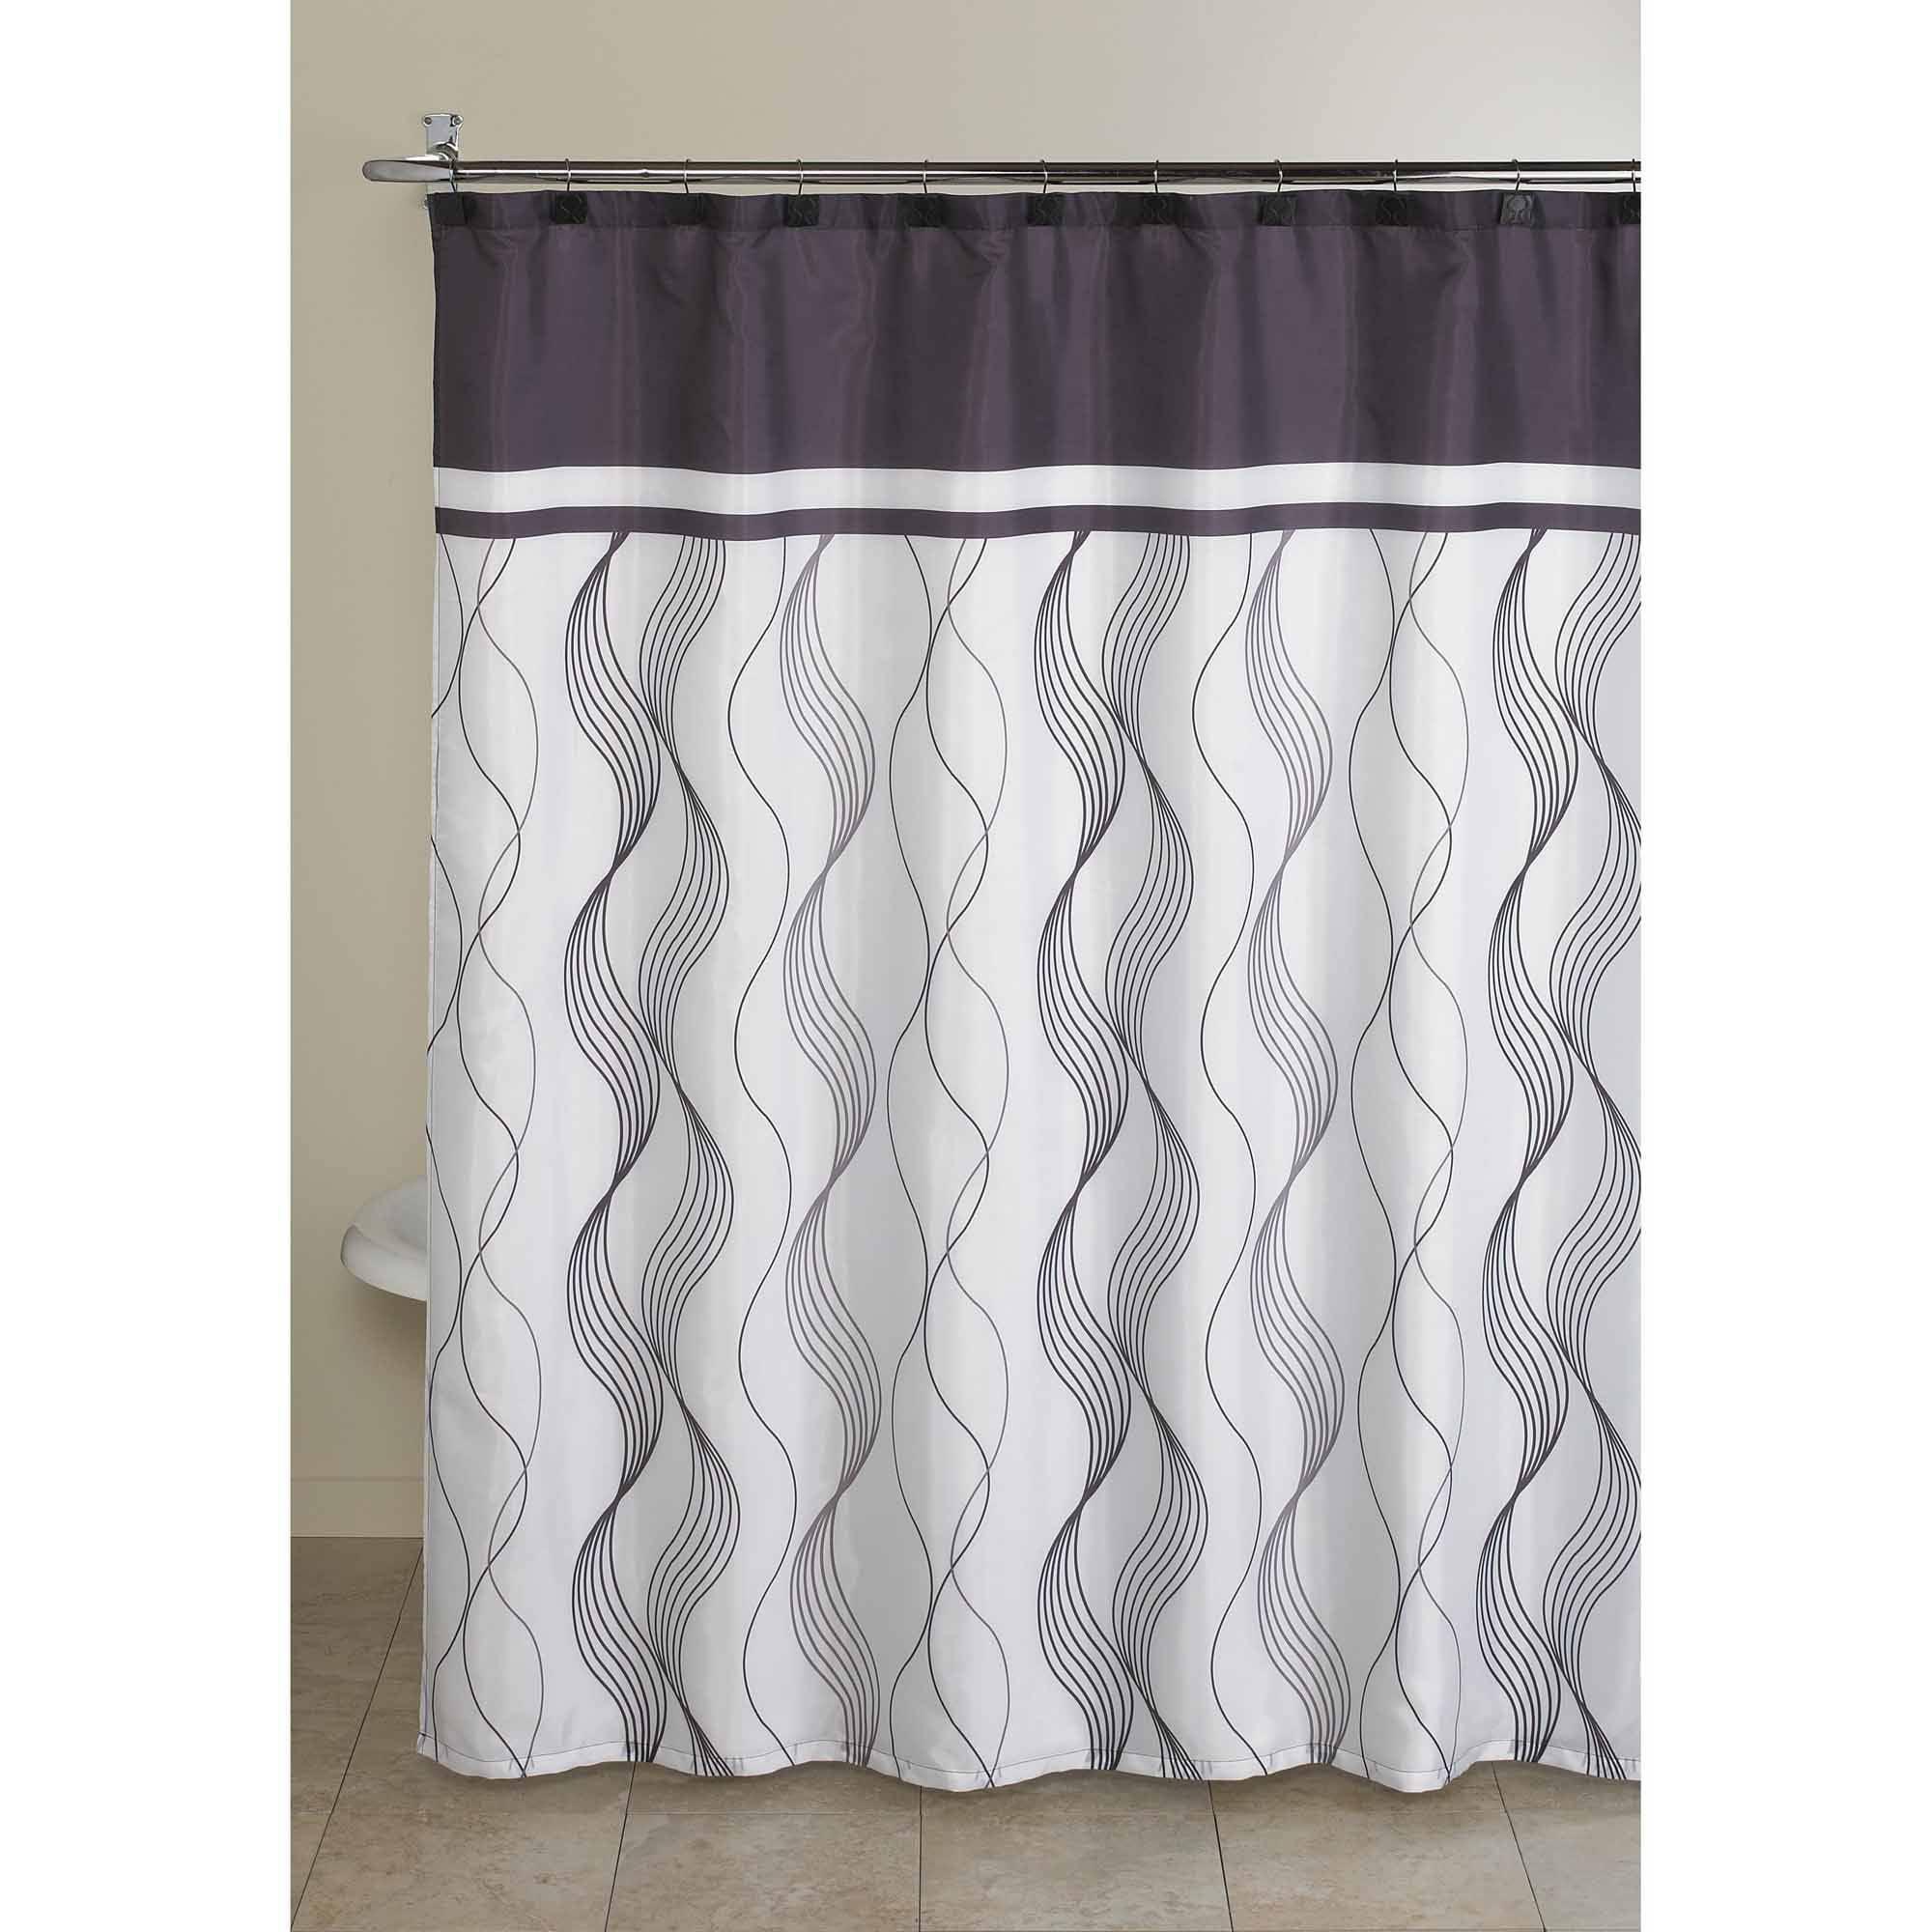 hardwarecustom finials curtain g drapery shower decorative rodsdrapery curtains